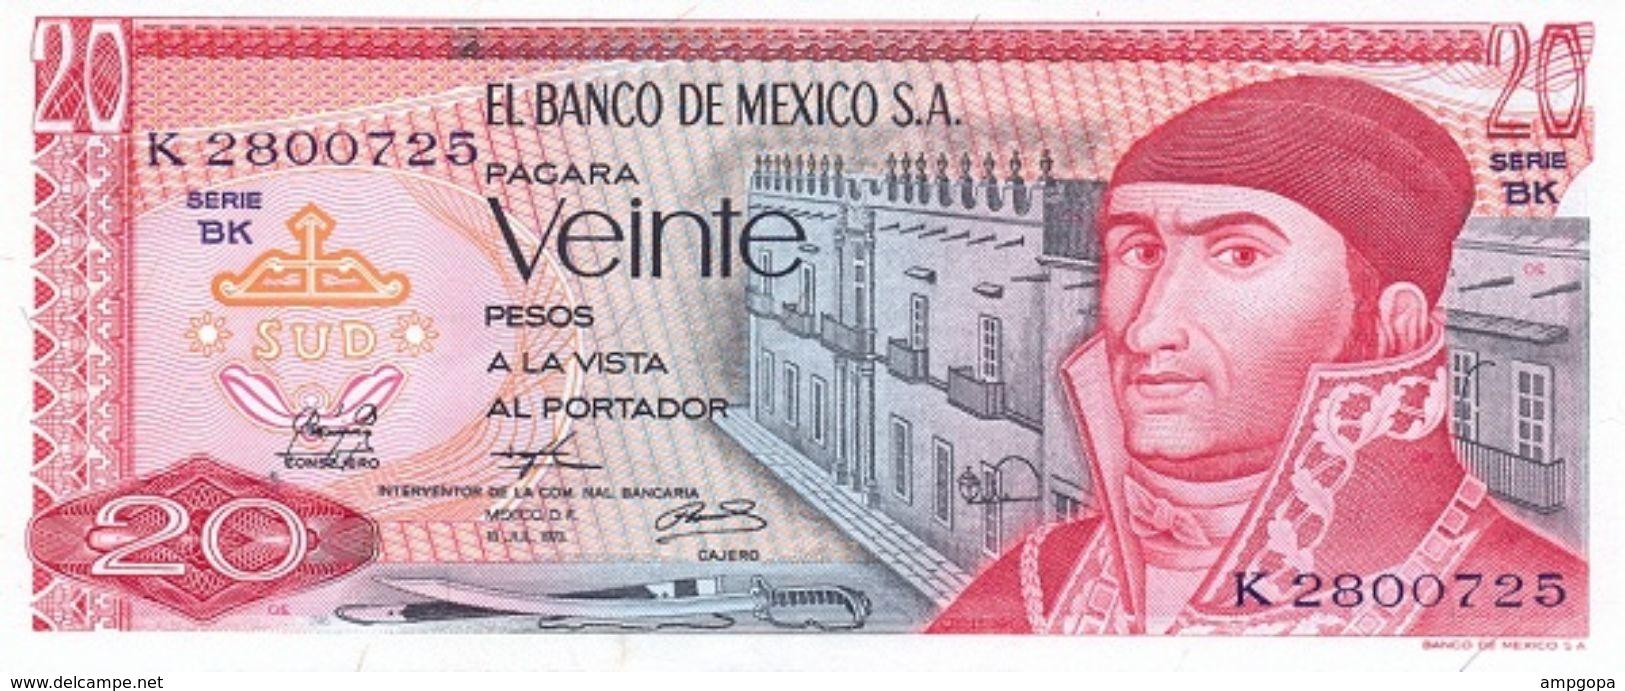 México 20 Pesos 18-7-1973 Pick 64.b.8 UNC - Mexico